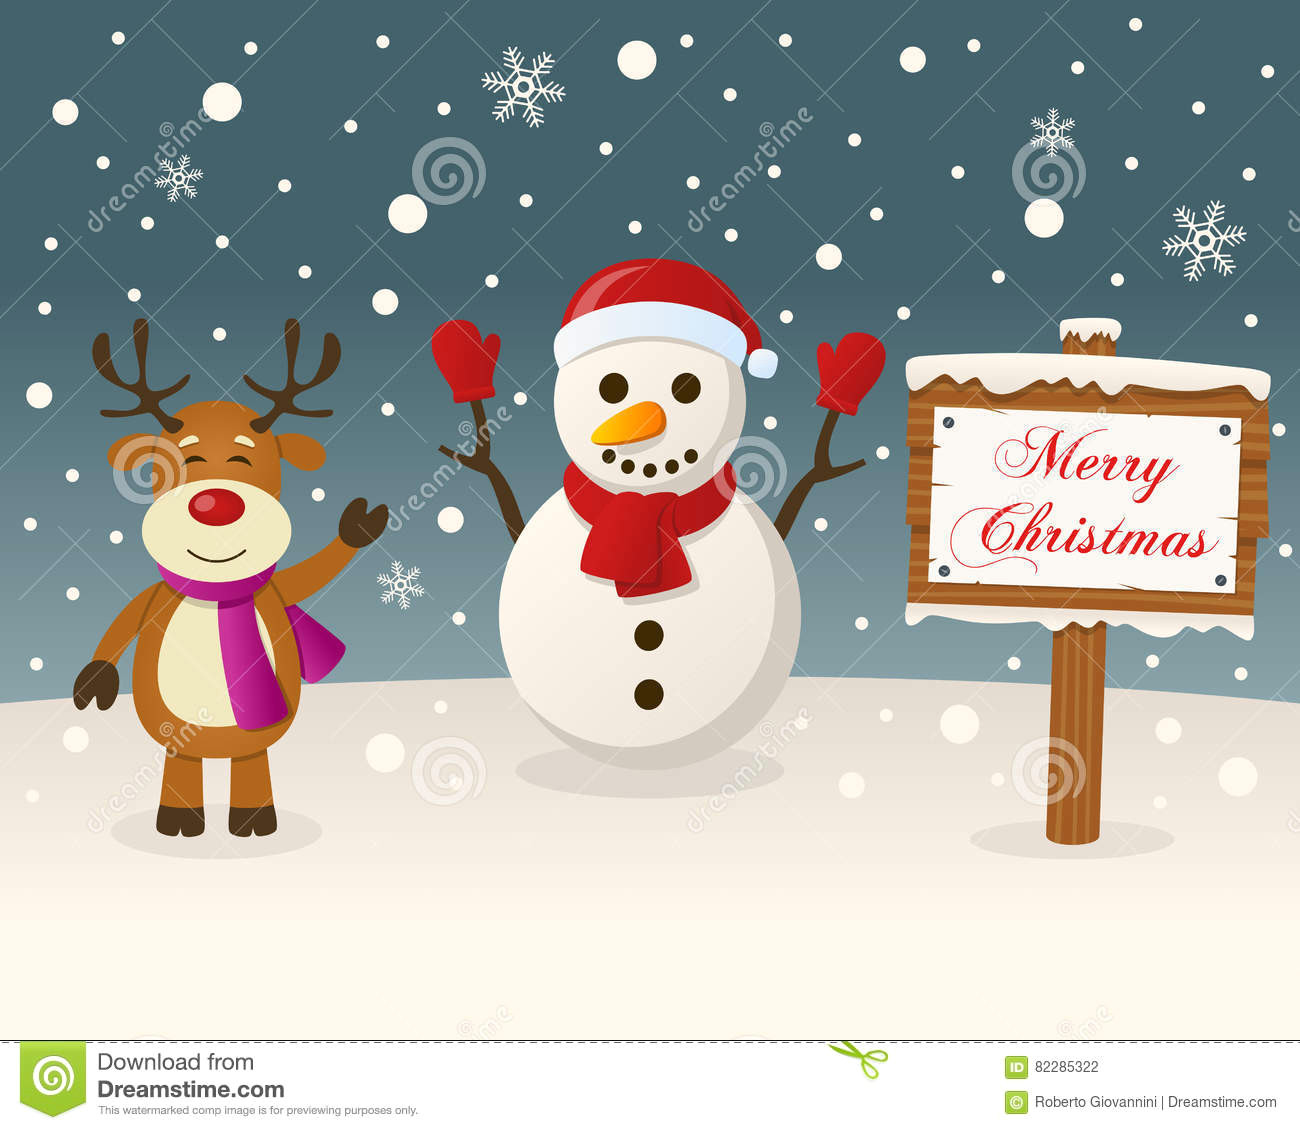 christmas sign snowman reindeer card cute happy smiling snowy scene merry wooden eps file 82285322 jpg